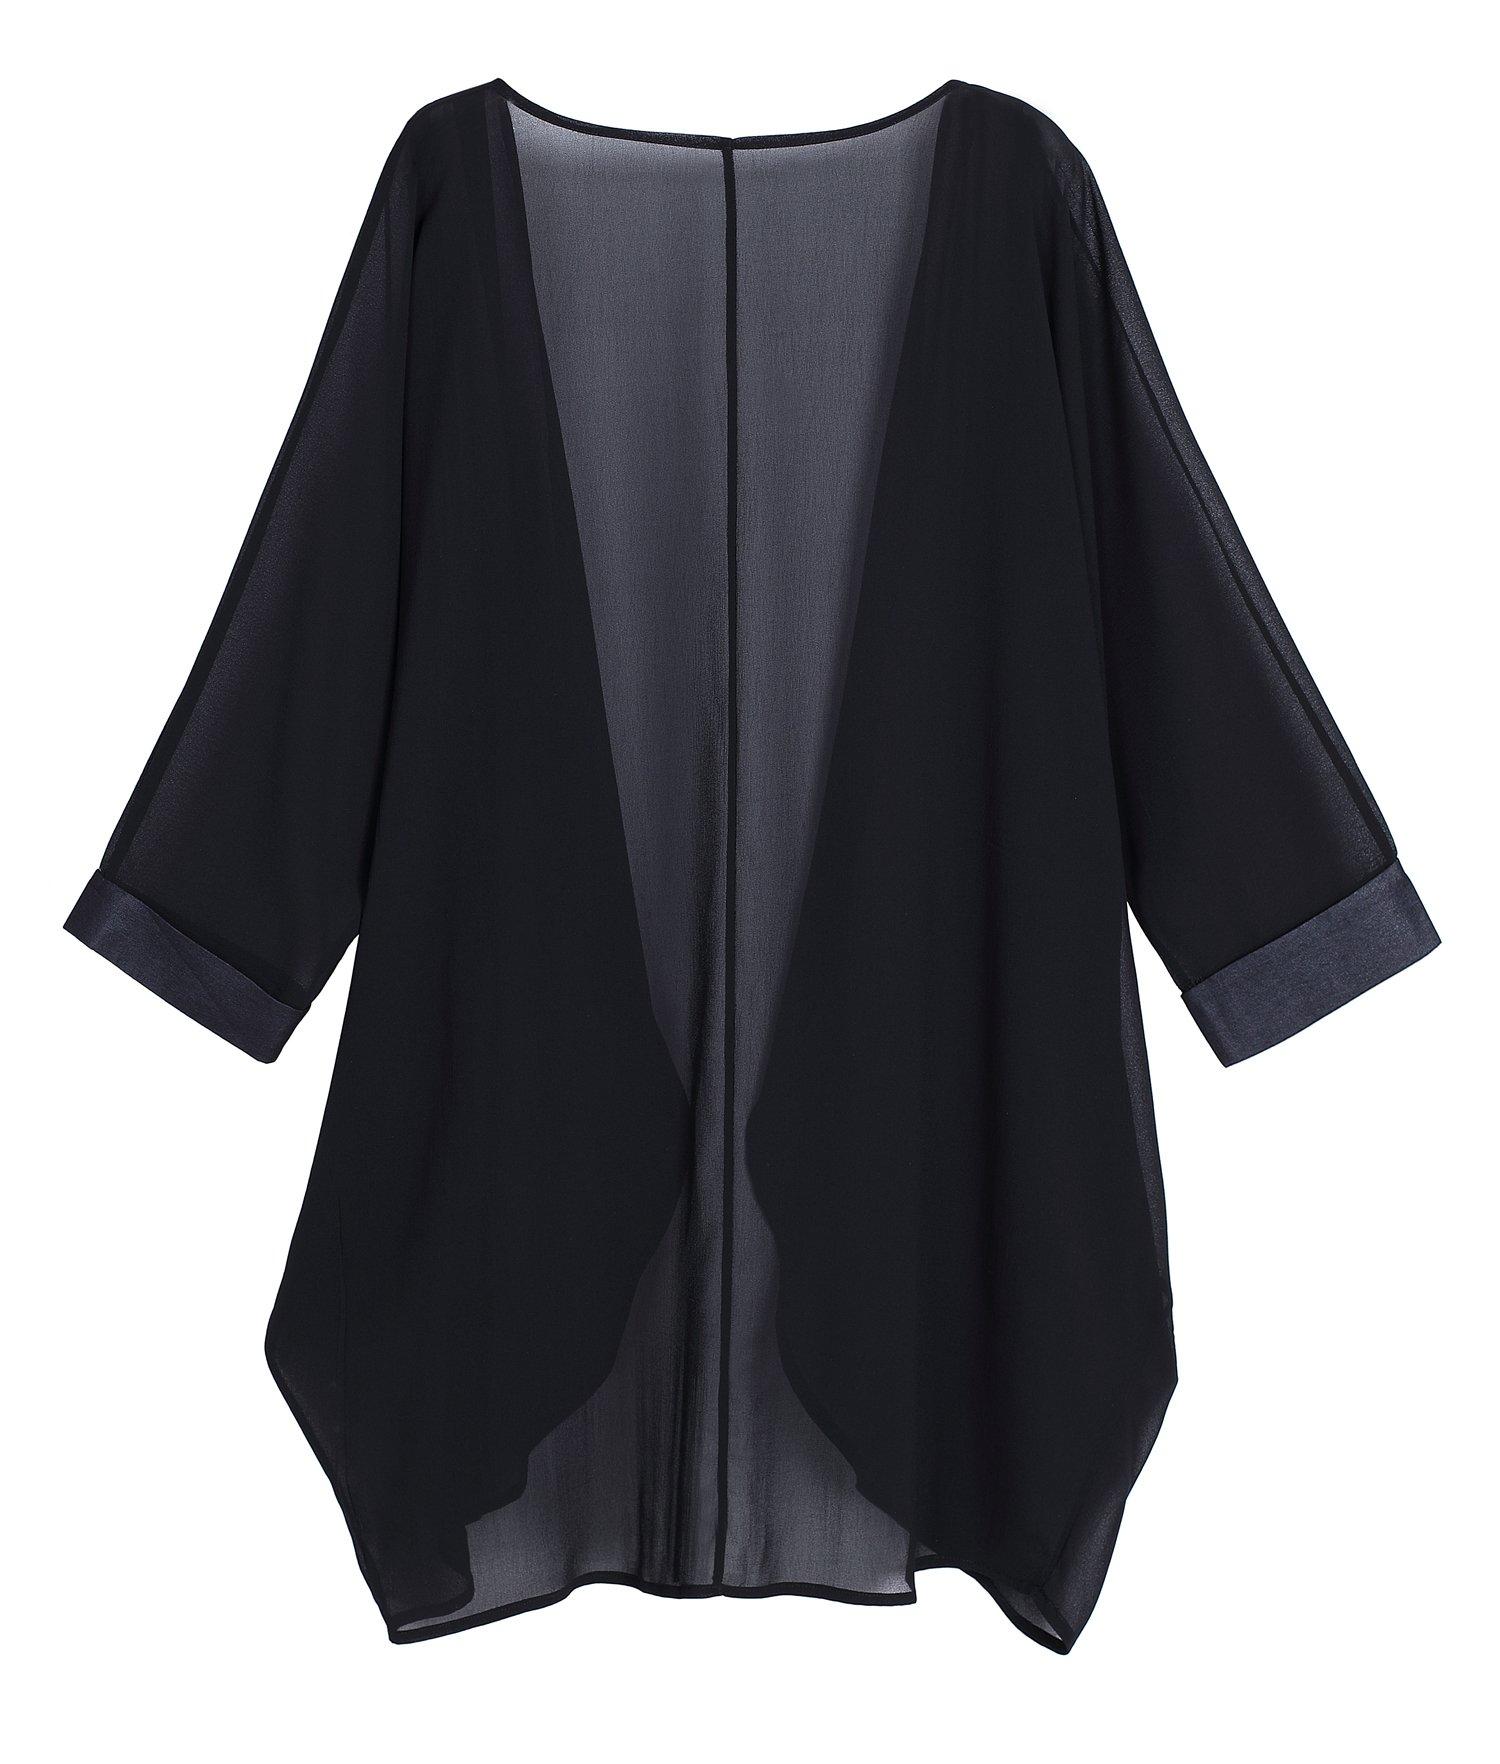 OLRAIN Women's Floral Print Sheer Chiffon Loose Kimono Cardigan Capes (X-Large, Black-1) by OLRAIN (Image #2)